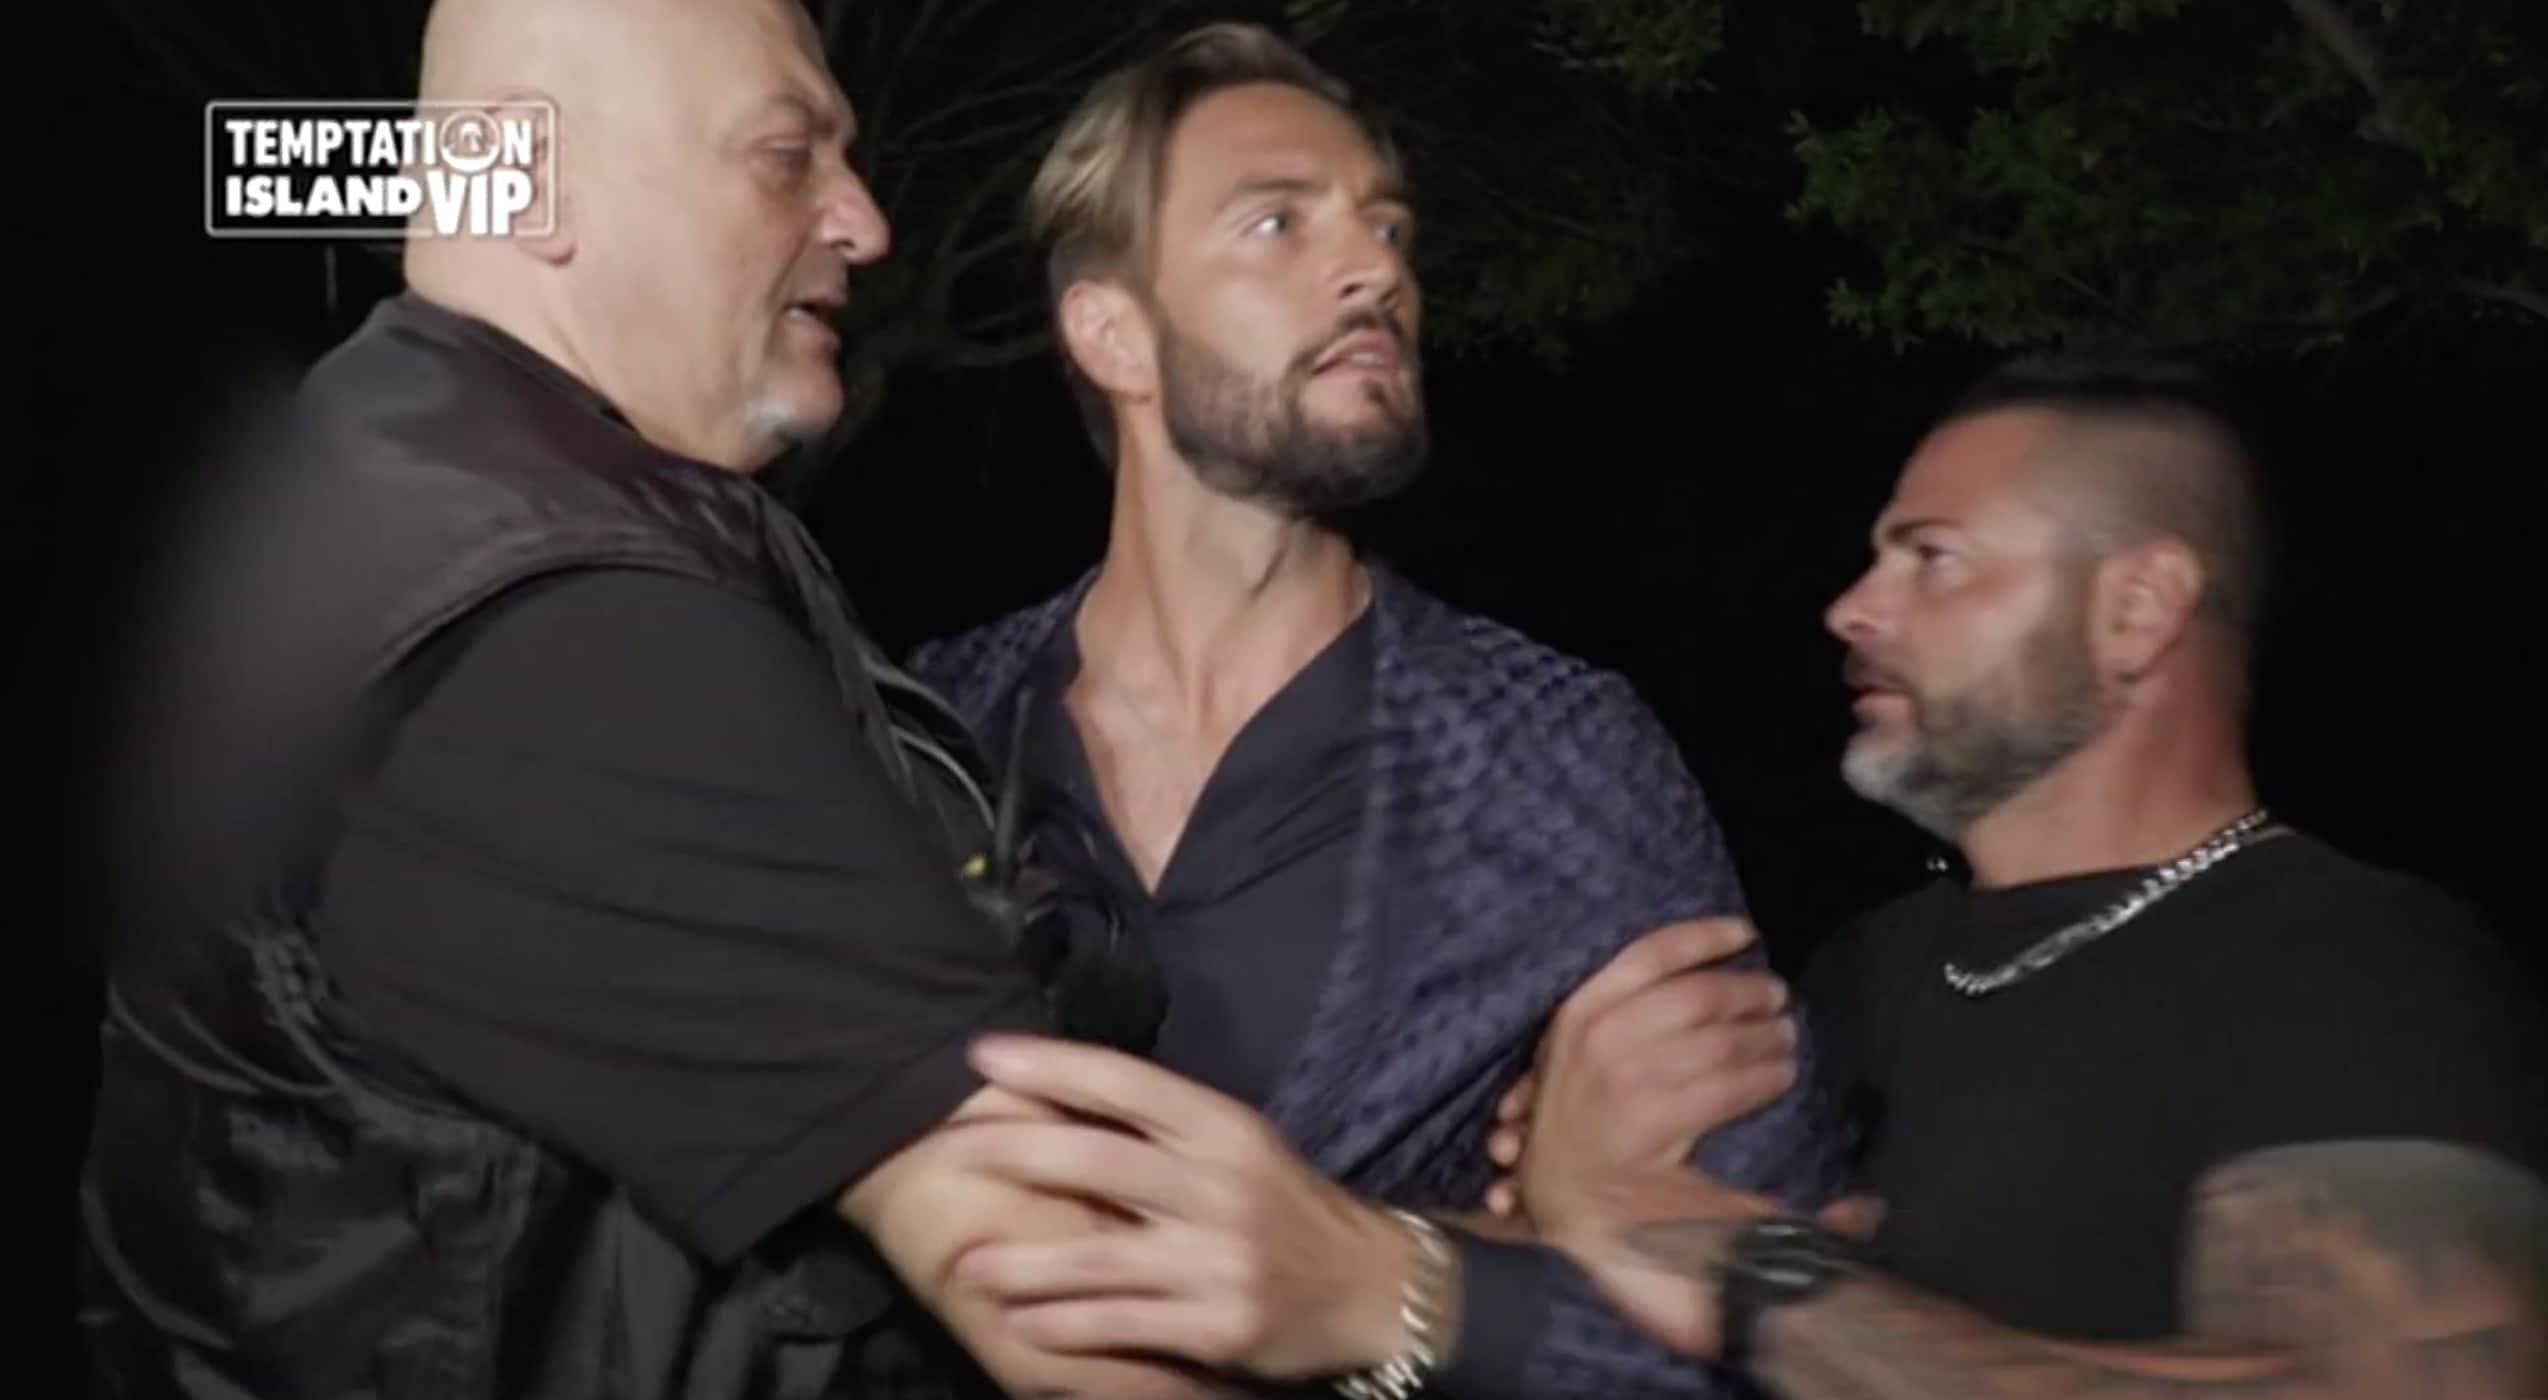 Temptation Island Vip 2 - puntata 14 ottobre Alex Belli furioso